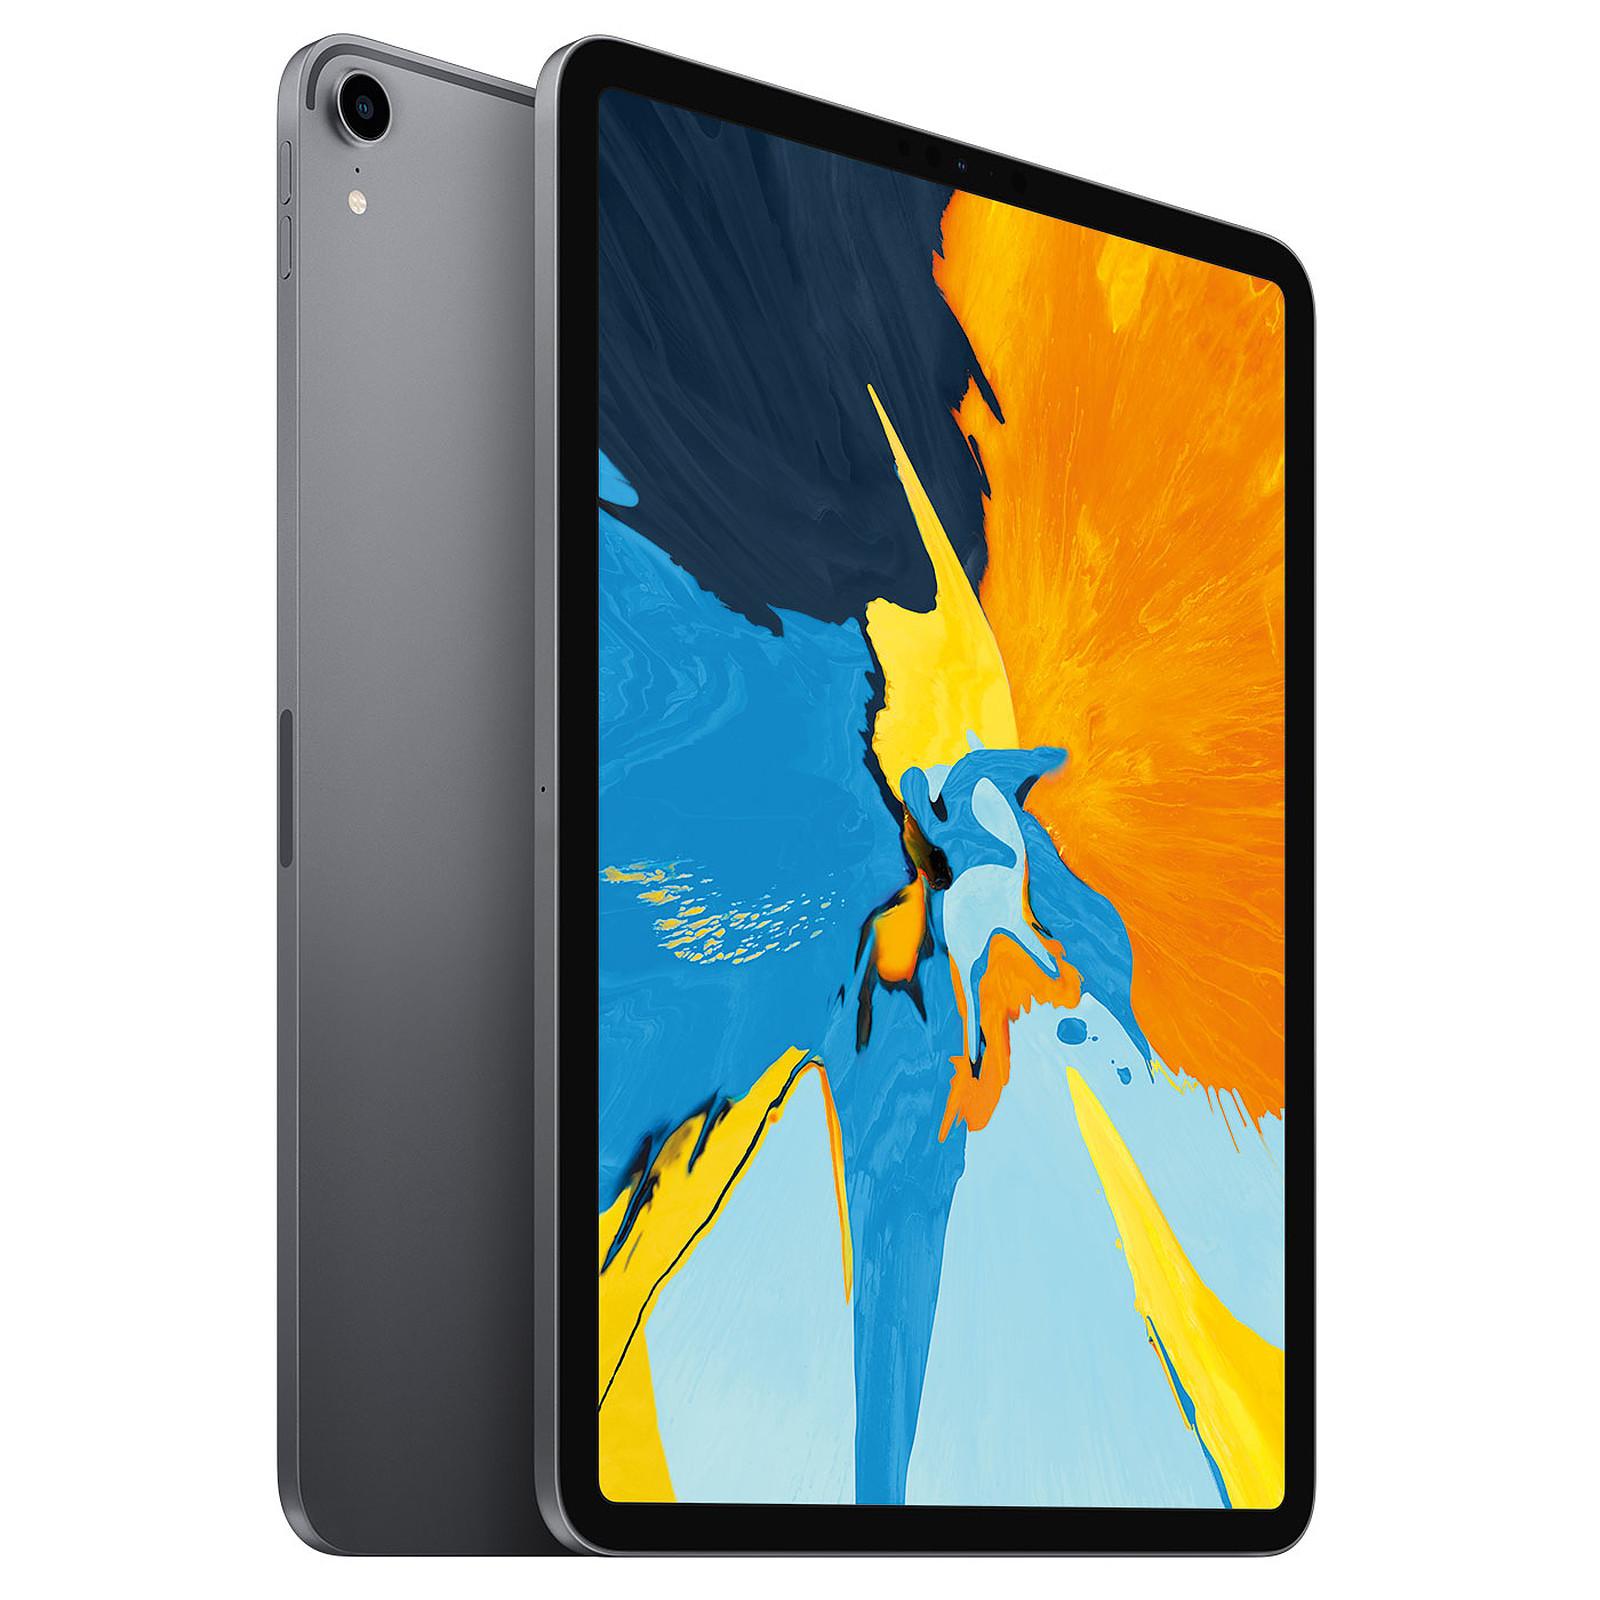 Apple iPad Pro 11-inch Wi-Fi + LTE 64GB Space Gray (2018)